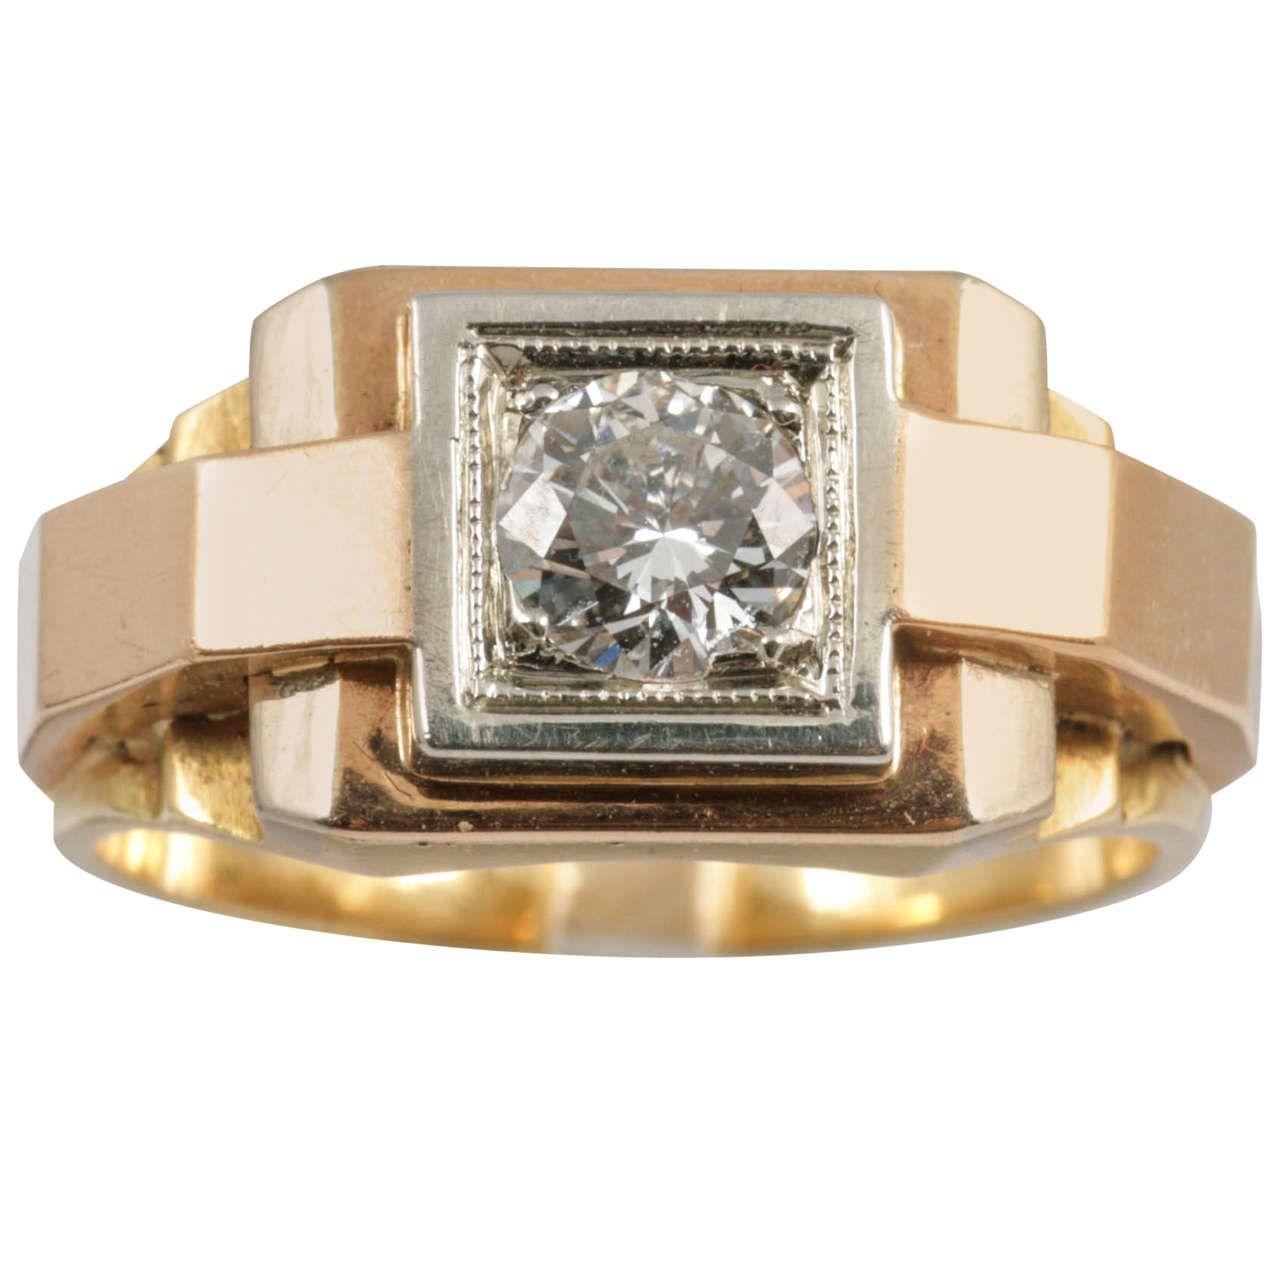 1940s Diamond Gold Dress Ring 1stdibs Com Antique Rings For Sale Antique Rings Gold Diamond Jewelry